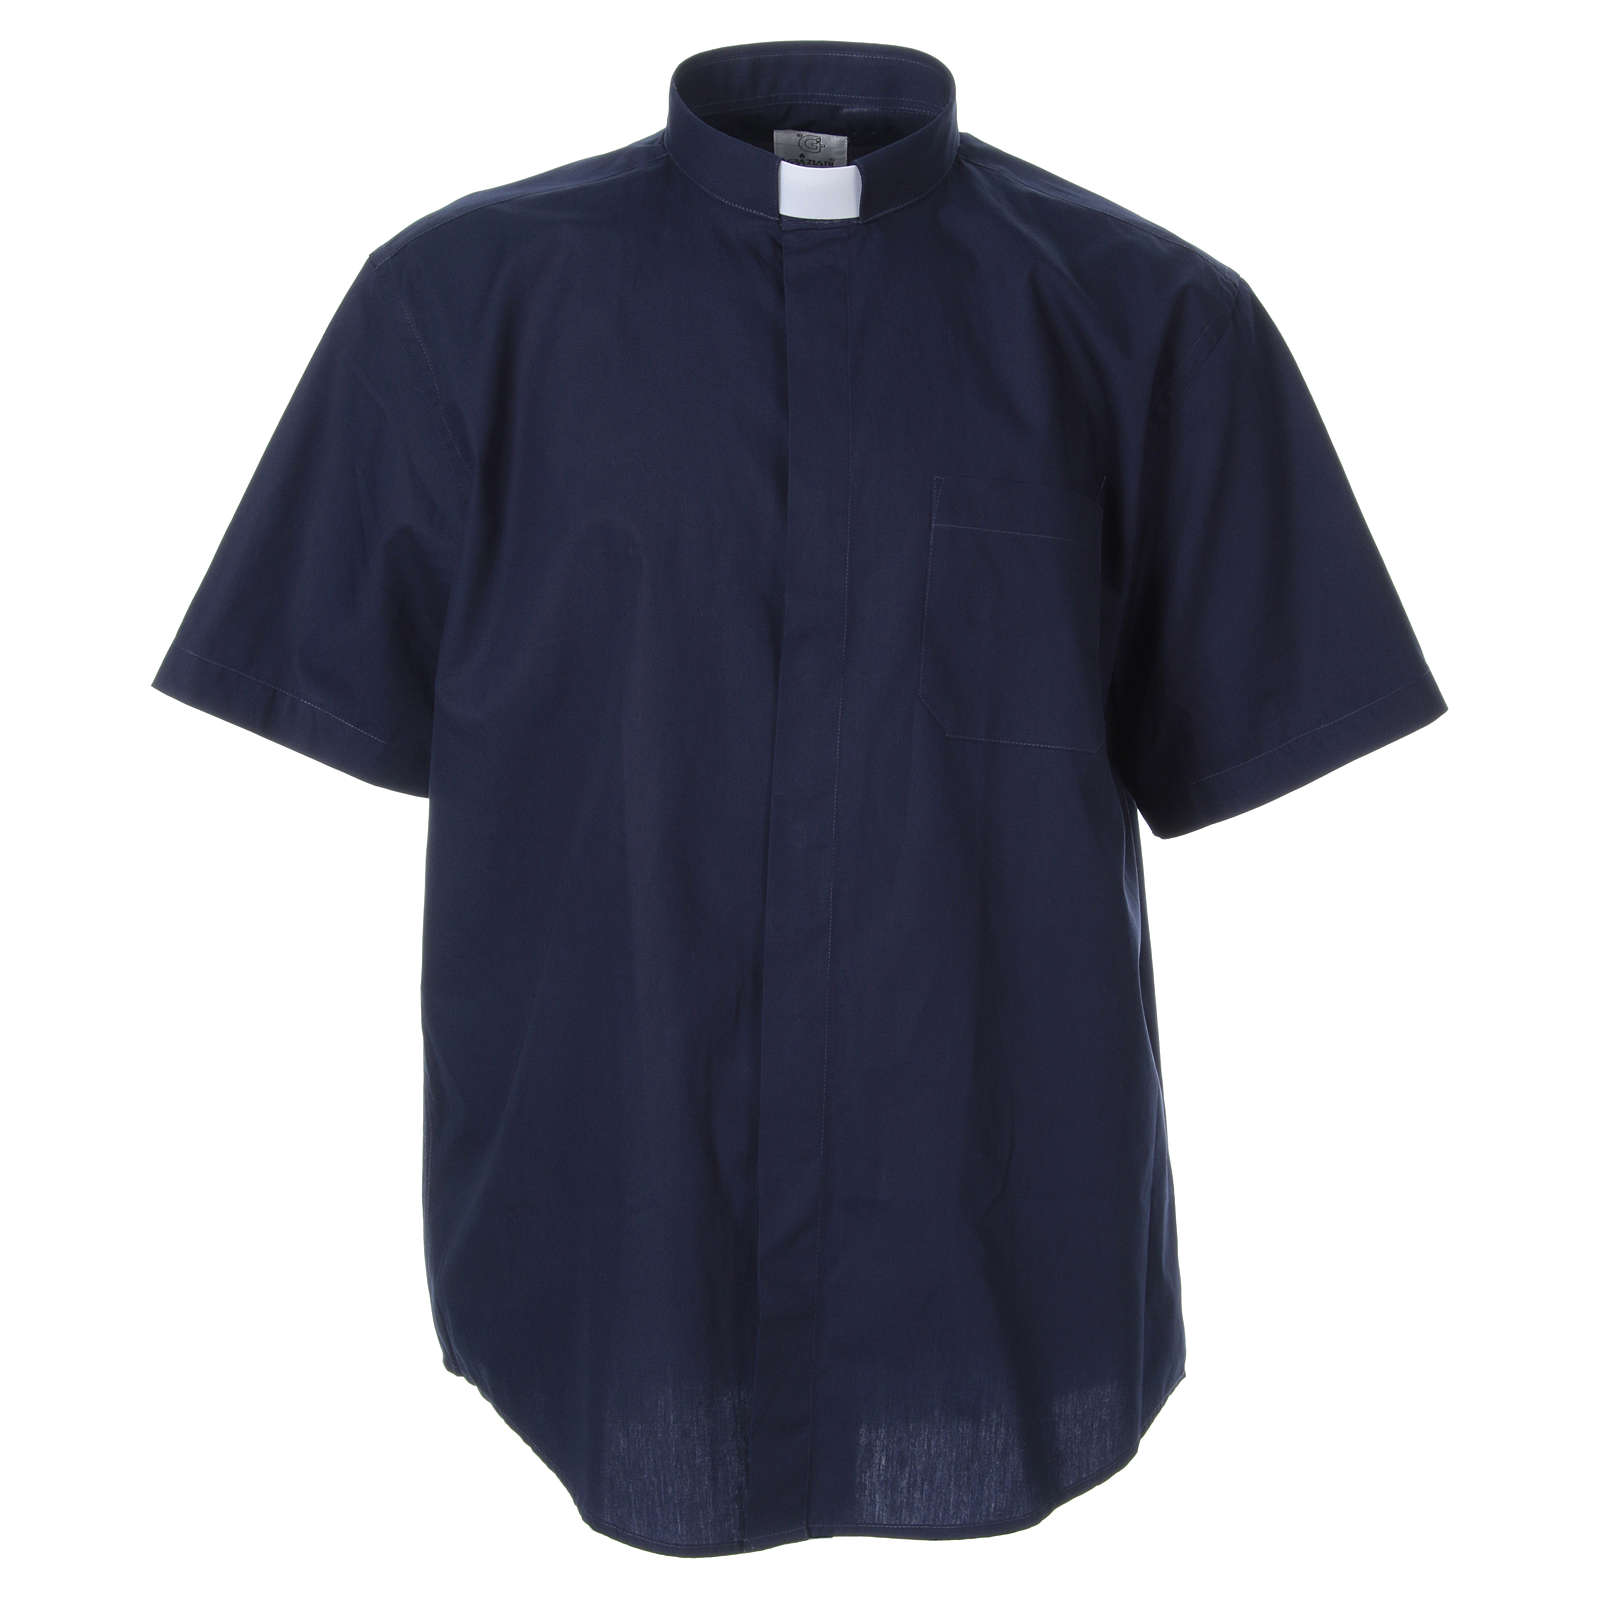 STOCK Chemise clergyman manches courtes popeline bleu 4